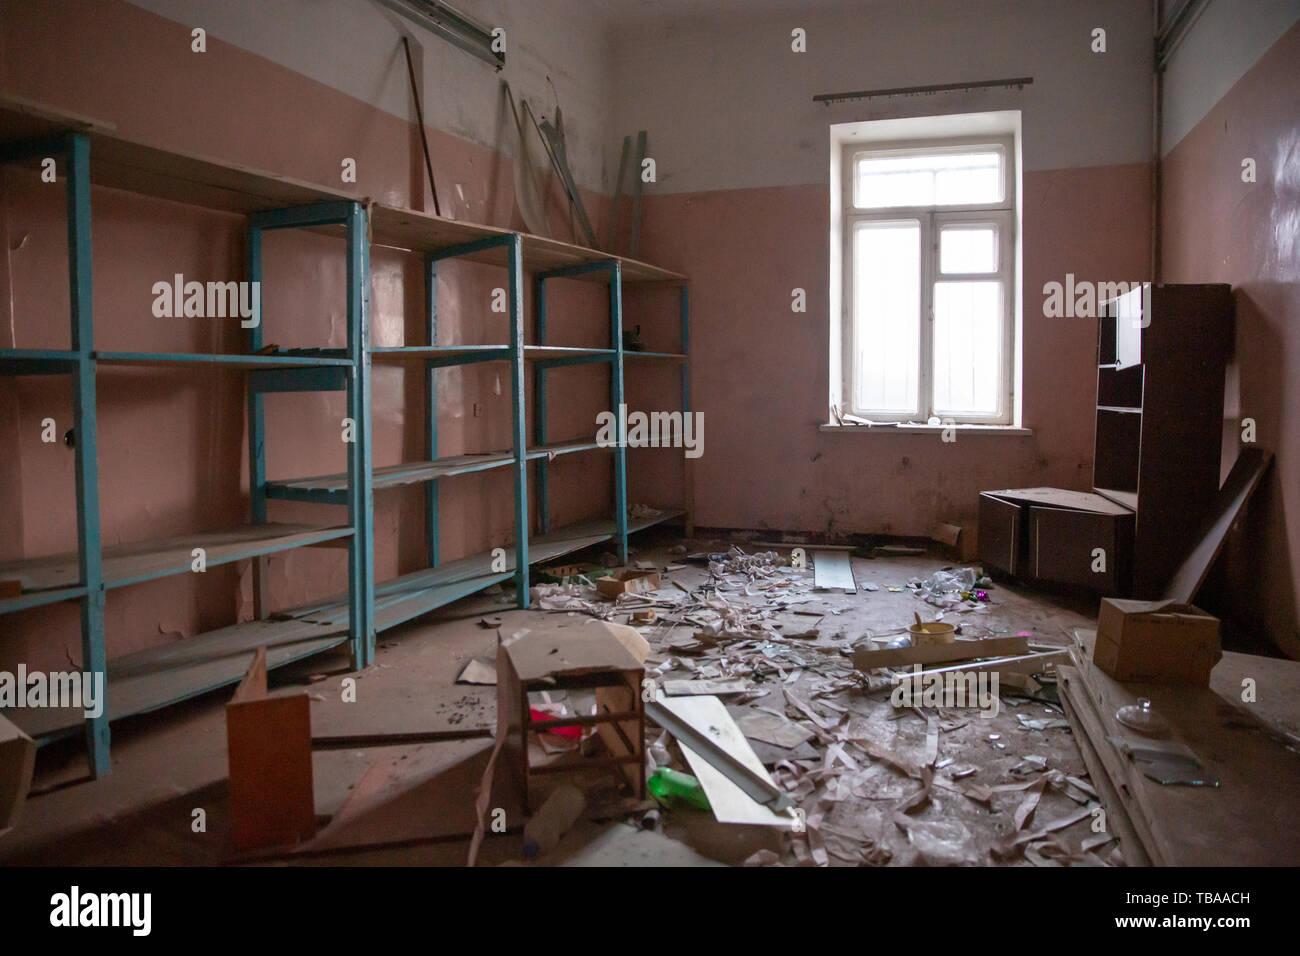 St. Petersburg, Russia - April 23, 2014: Neglected Neuropsychiatric Boarding School. - Stock Image